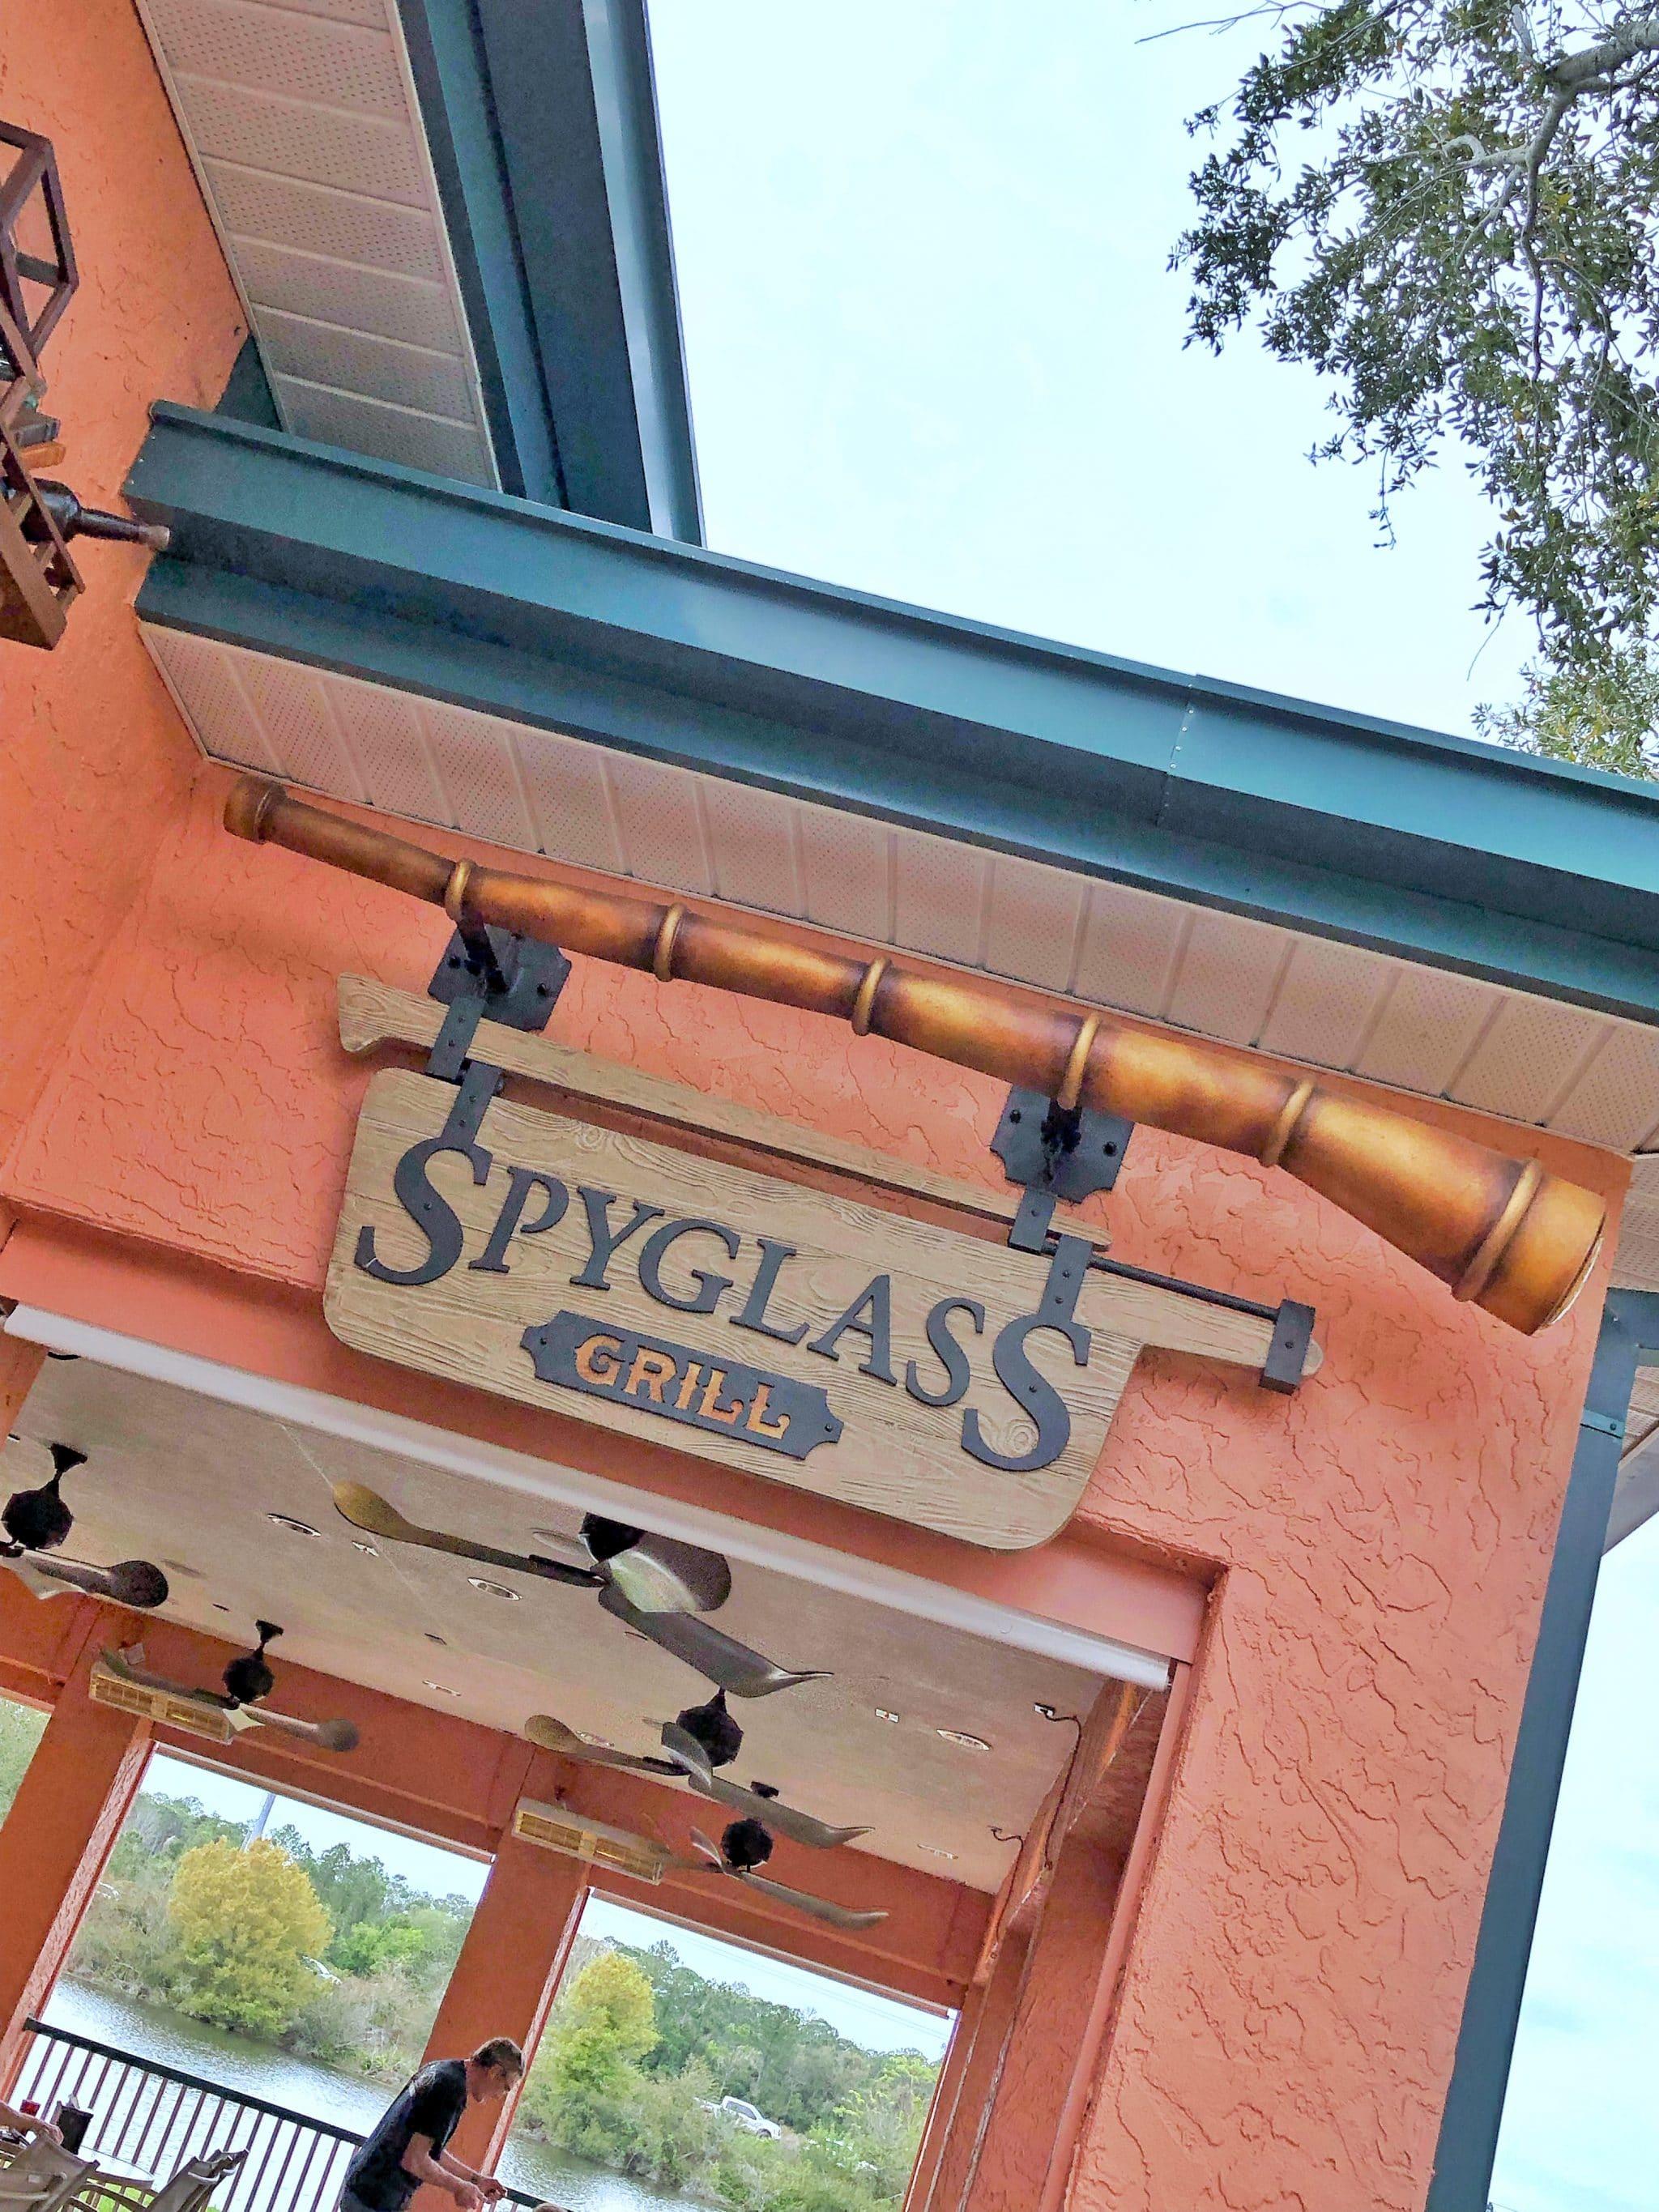 Spyglass Grill at Disney's Caribbean Beach Resort at Walt Disney World